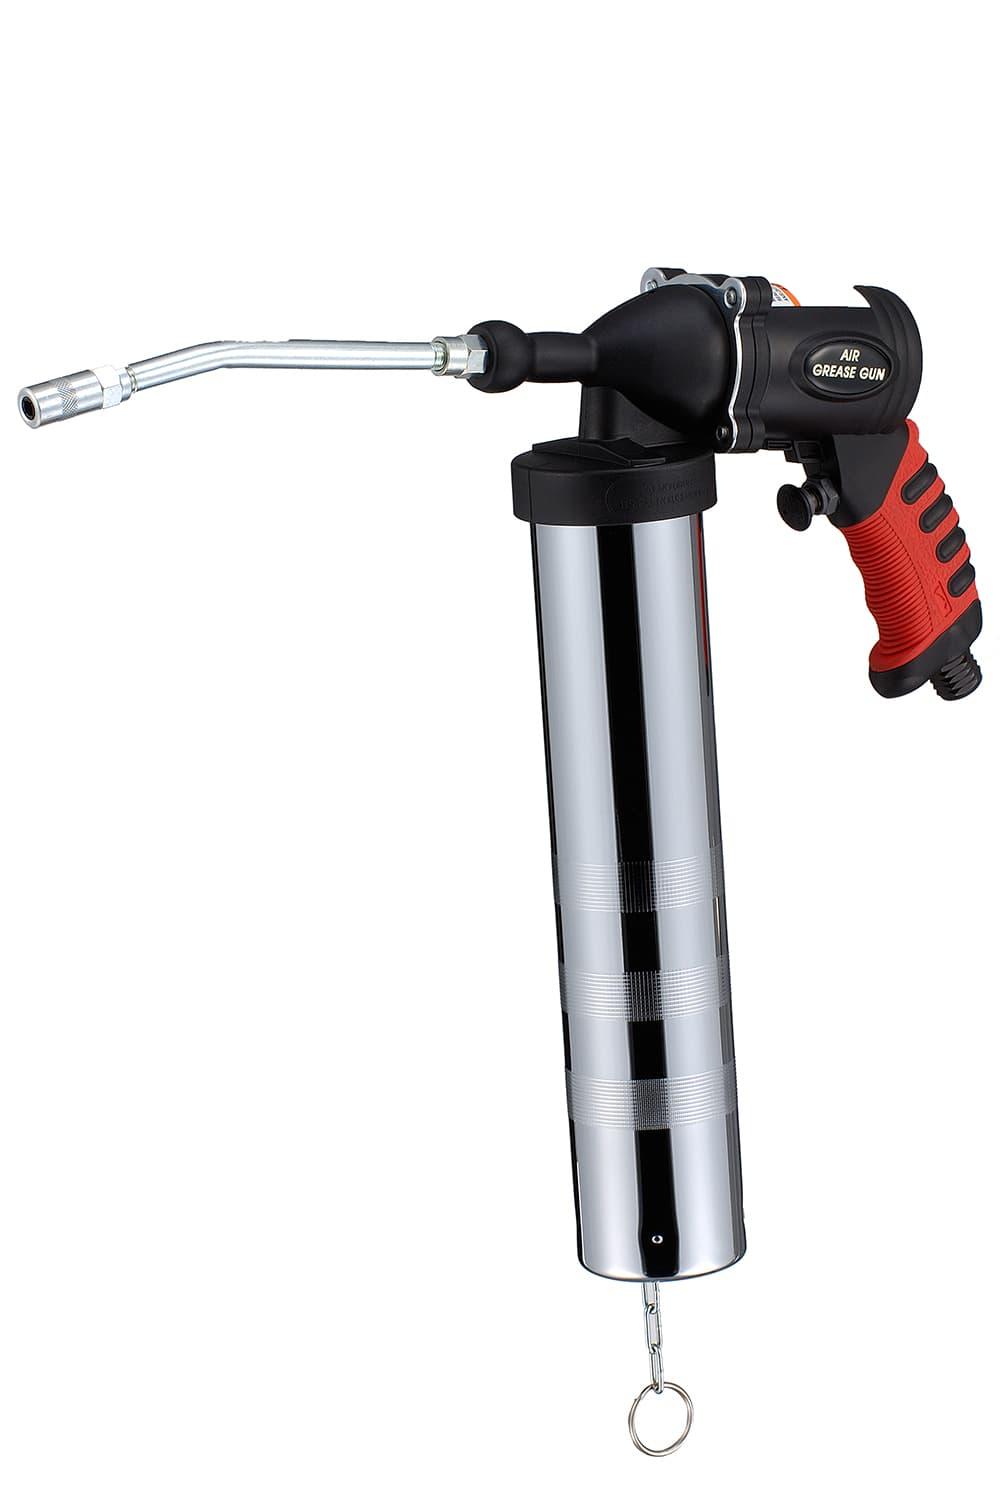 Grease Guns: Air,Grease Gun,Hydraulic/Lubrication,ArconTooltech,Arcon